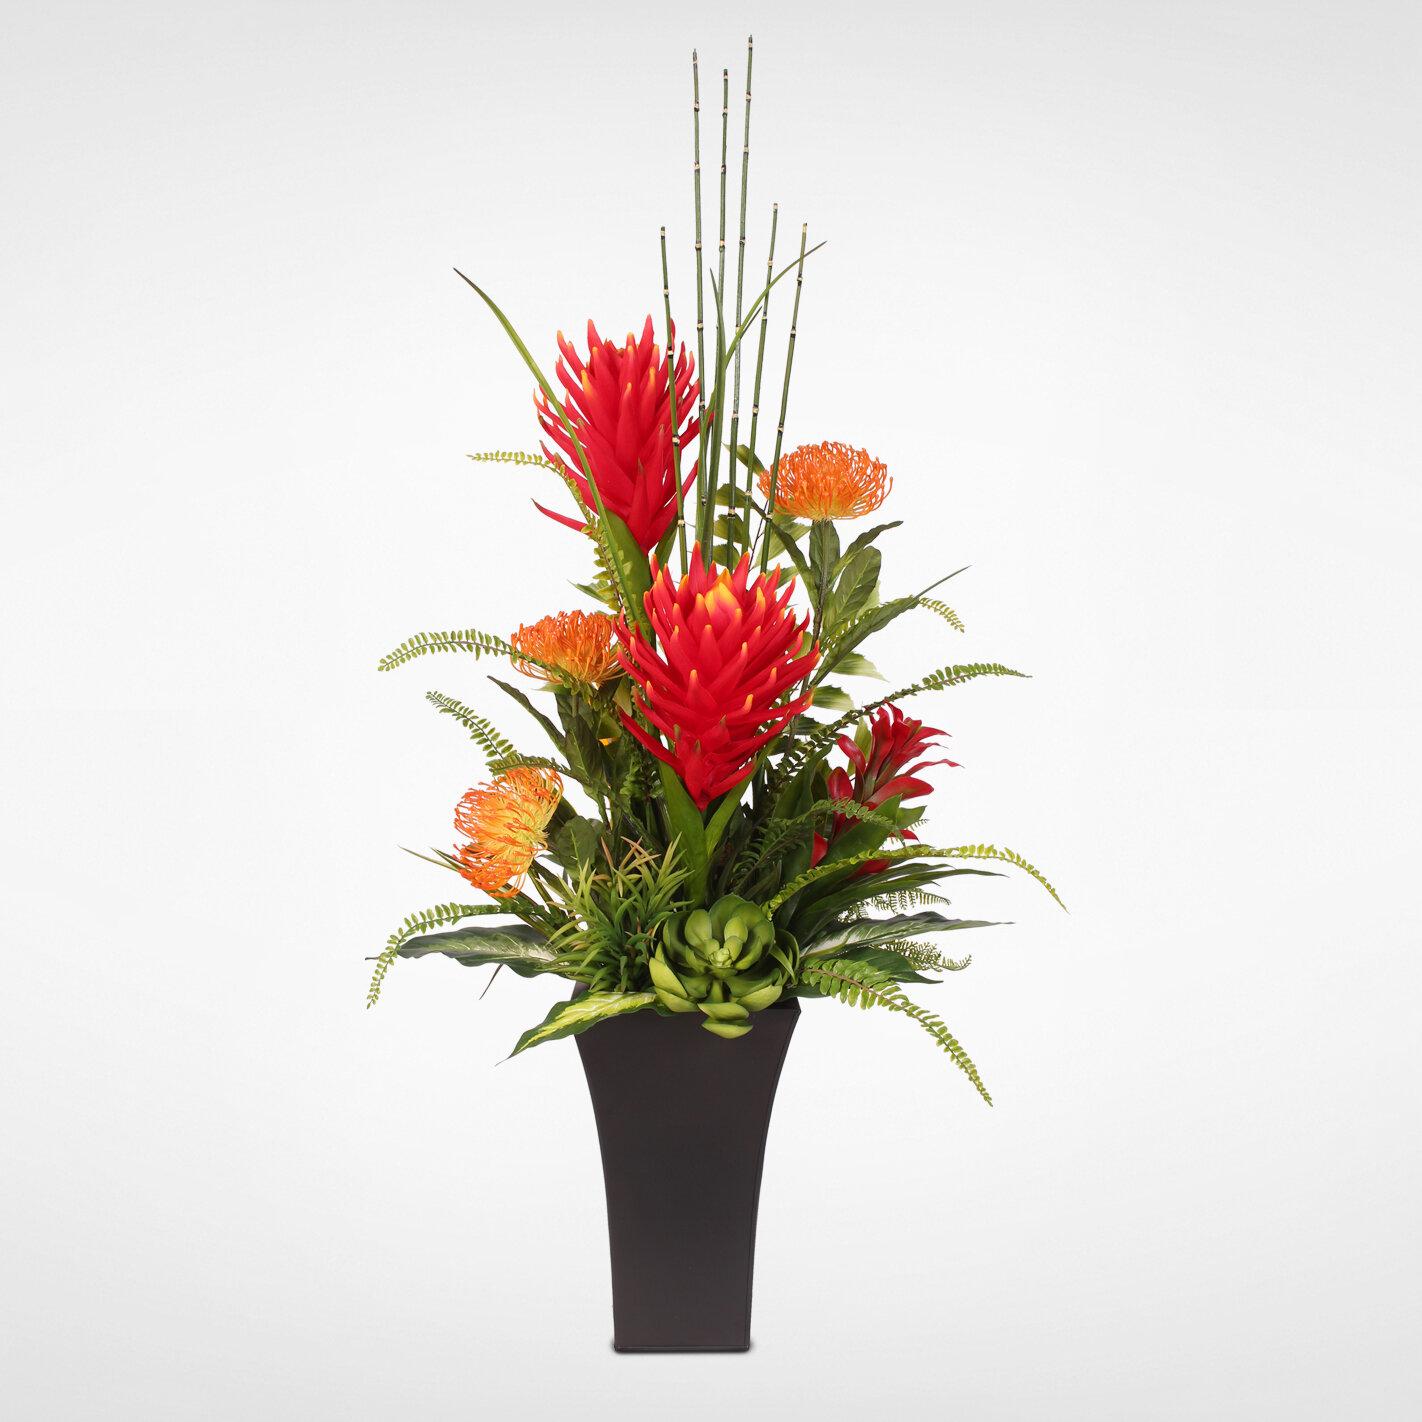 Red Barrel Studio Tropical Protea With Artificial Succulents Floral